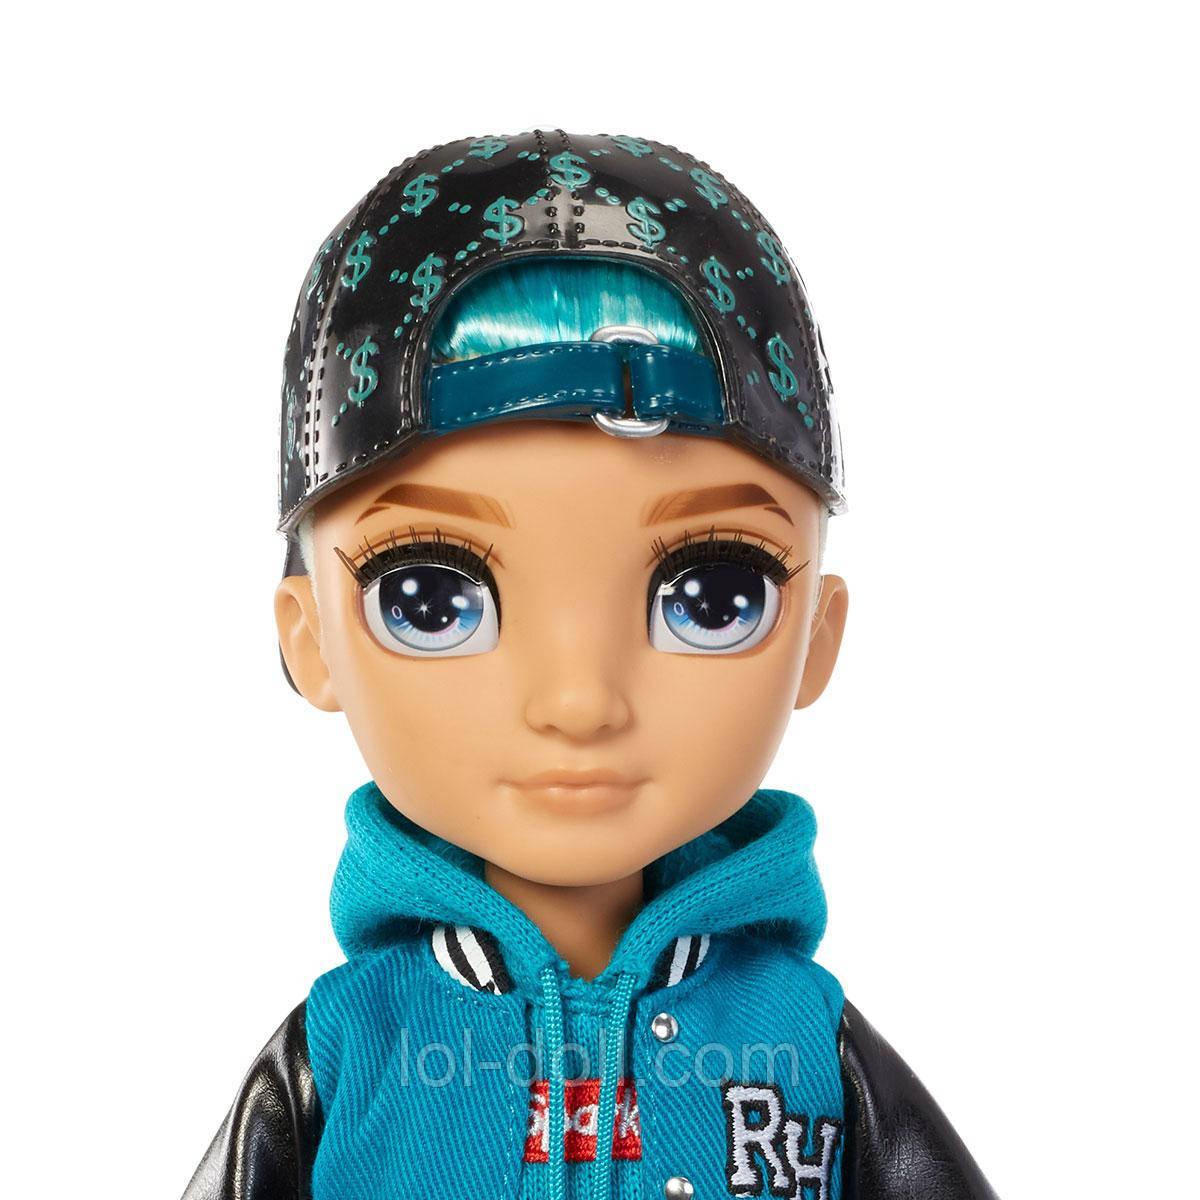 Кукла Рейнбоу Хай серия 2 Ривер Кендалл Rainbow High S2 River Kendall Fashion Doll